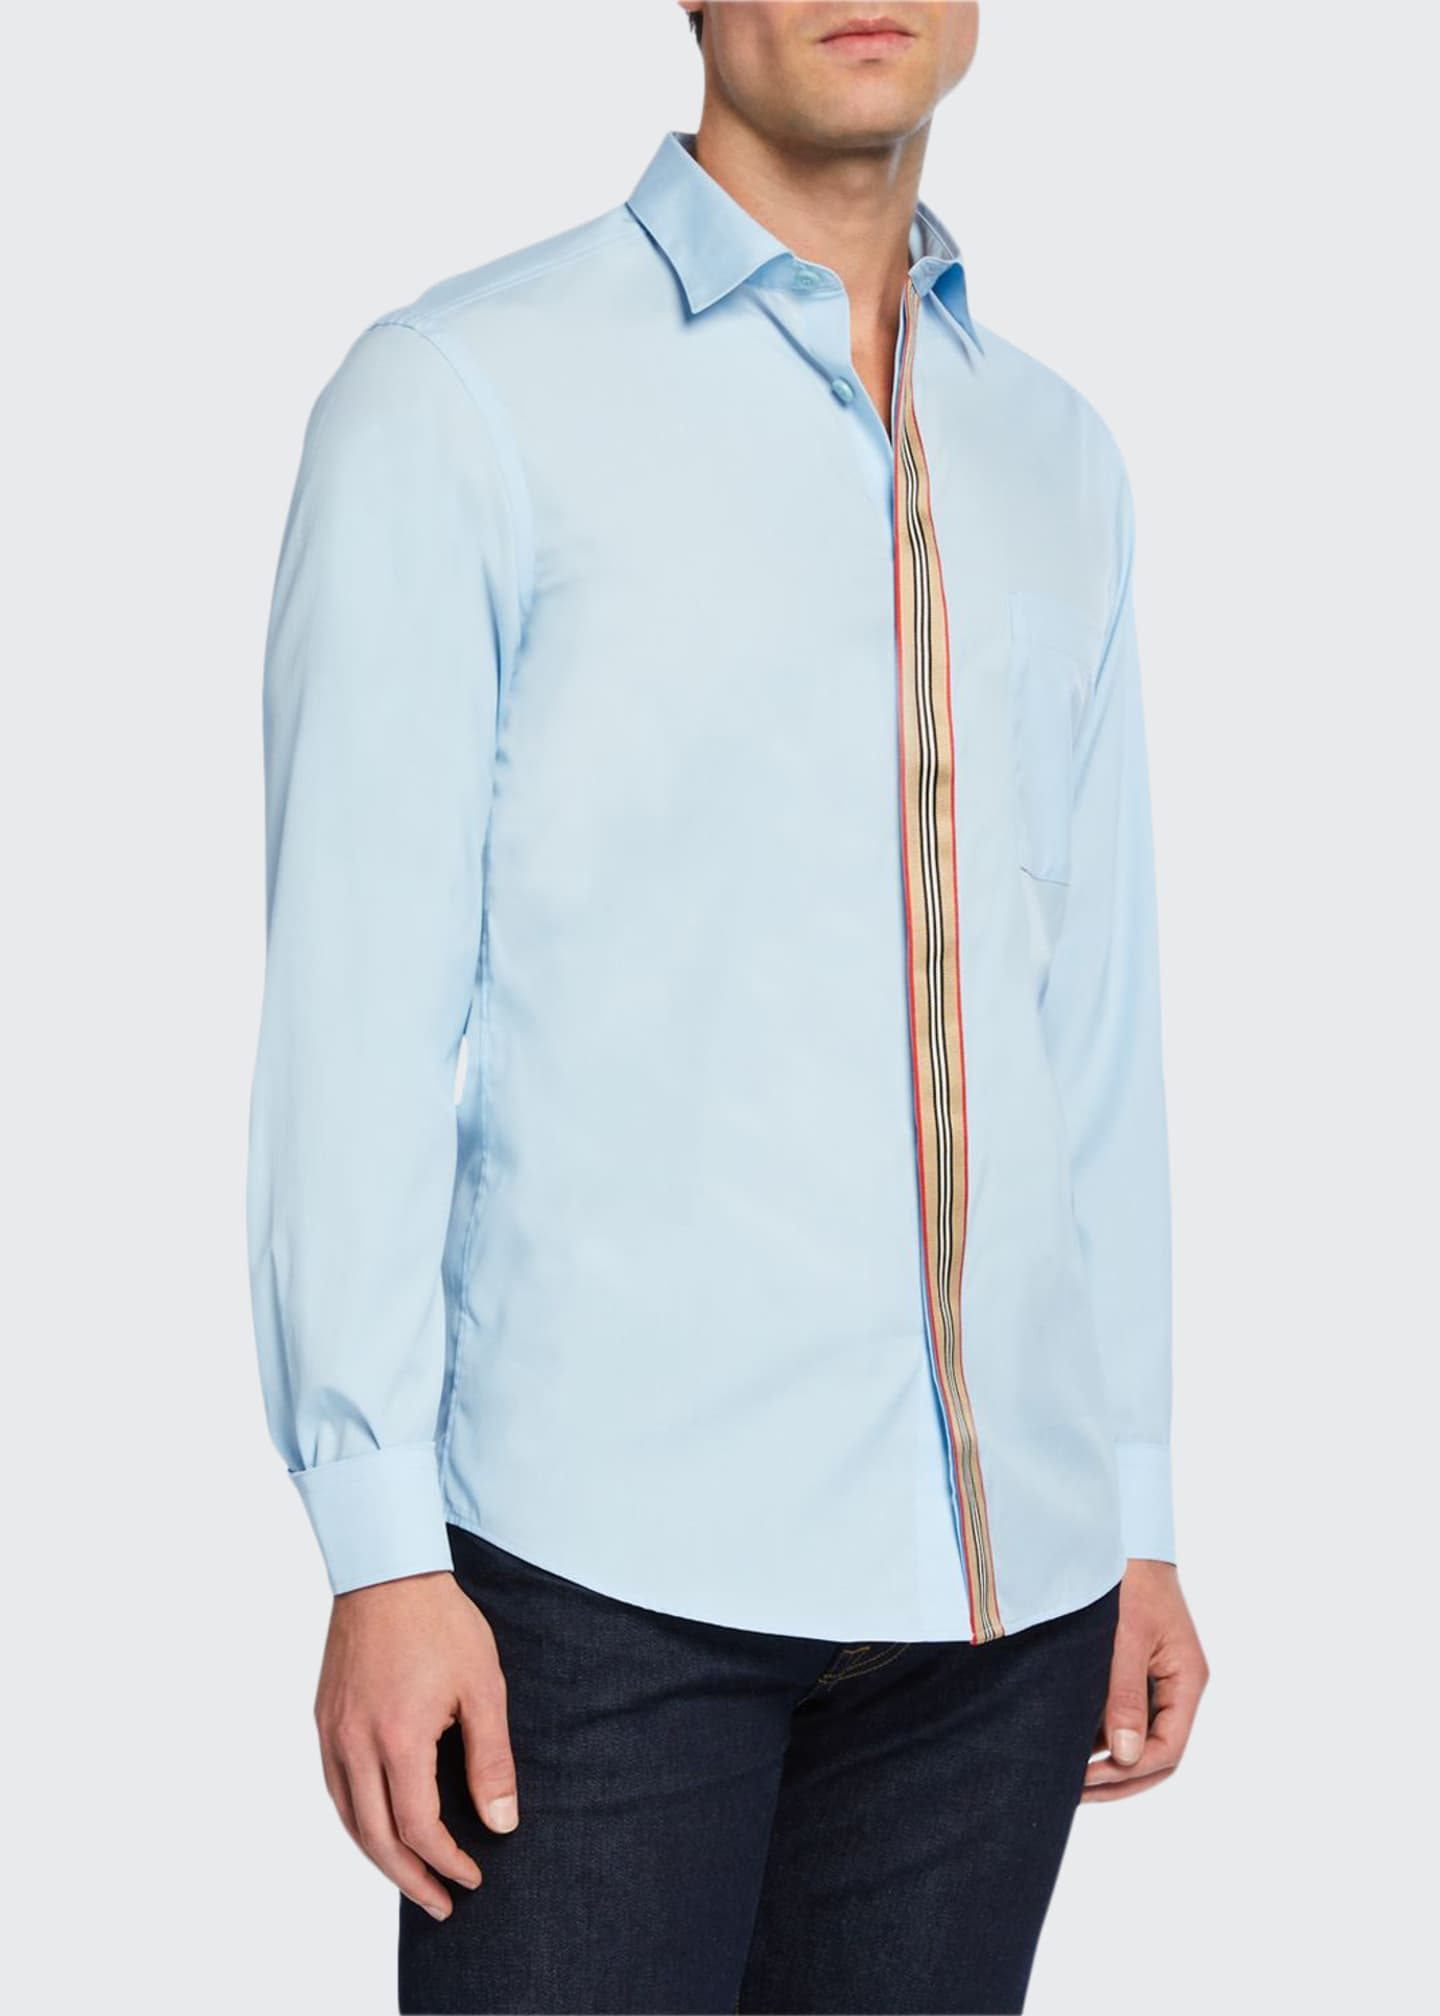 Burberry Men's Icon Striped Tape Oxford Shirt